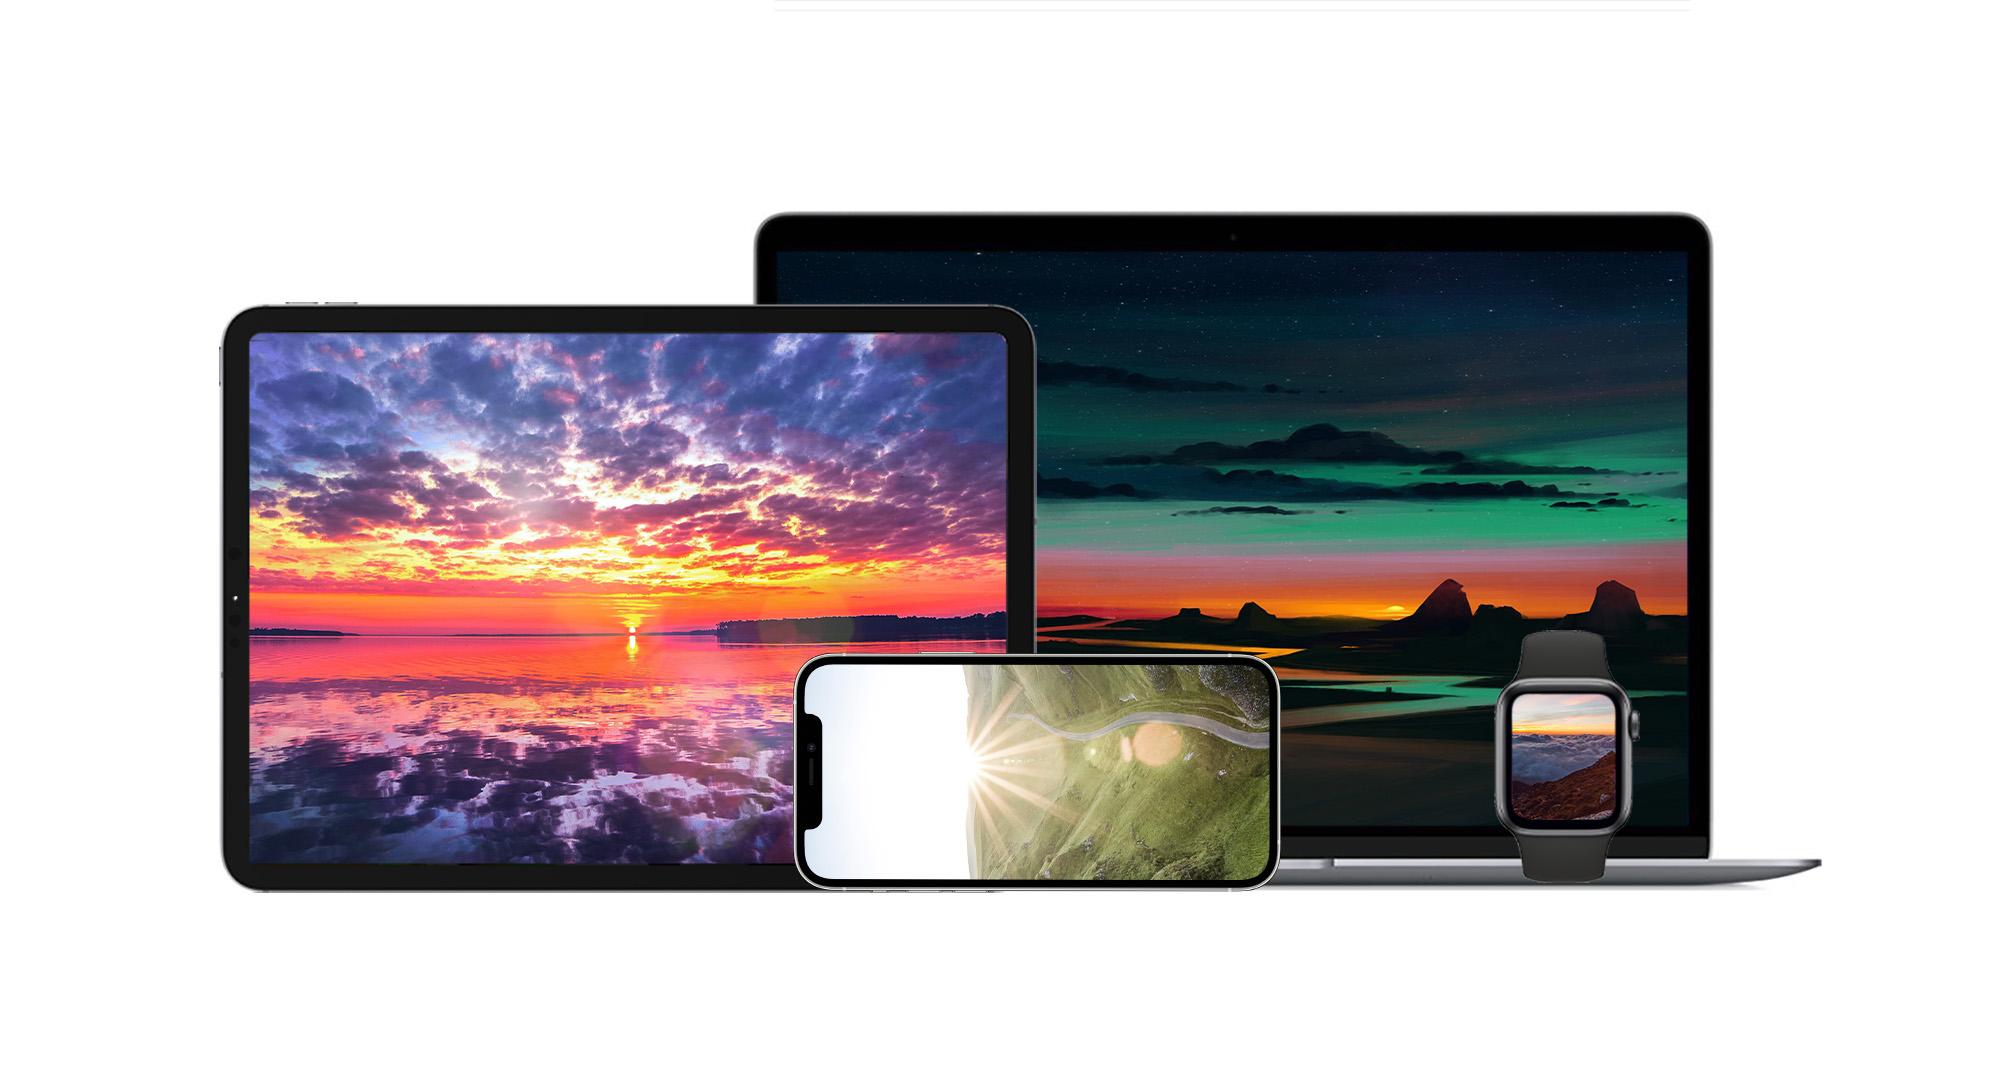 atardecer wallpapers iphone